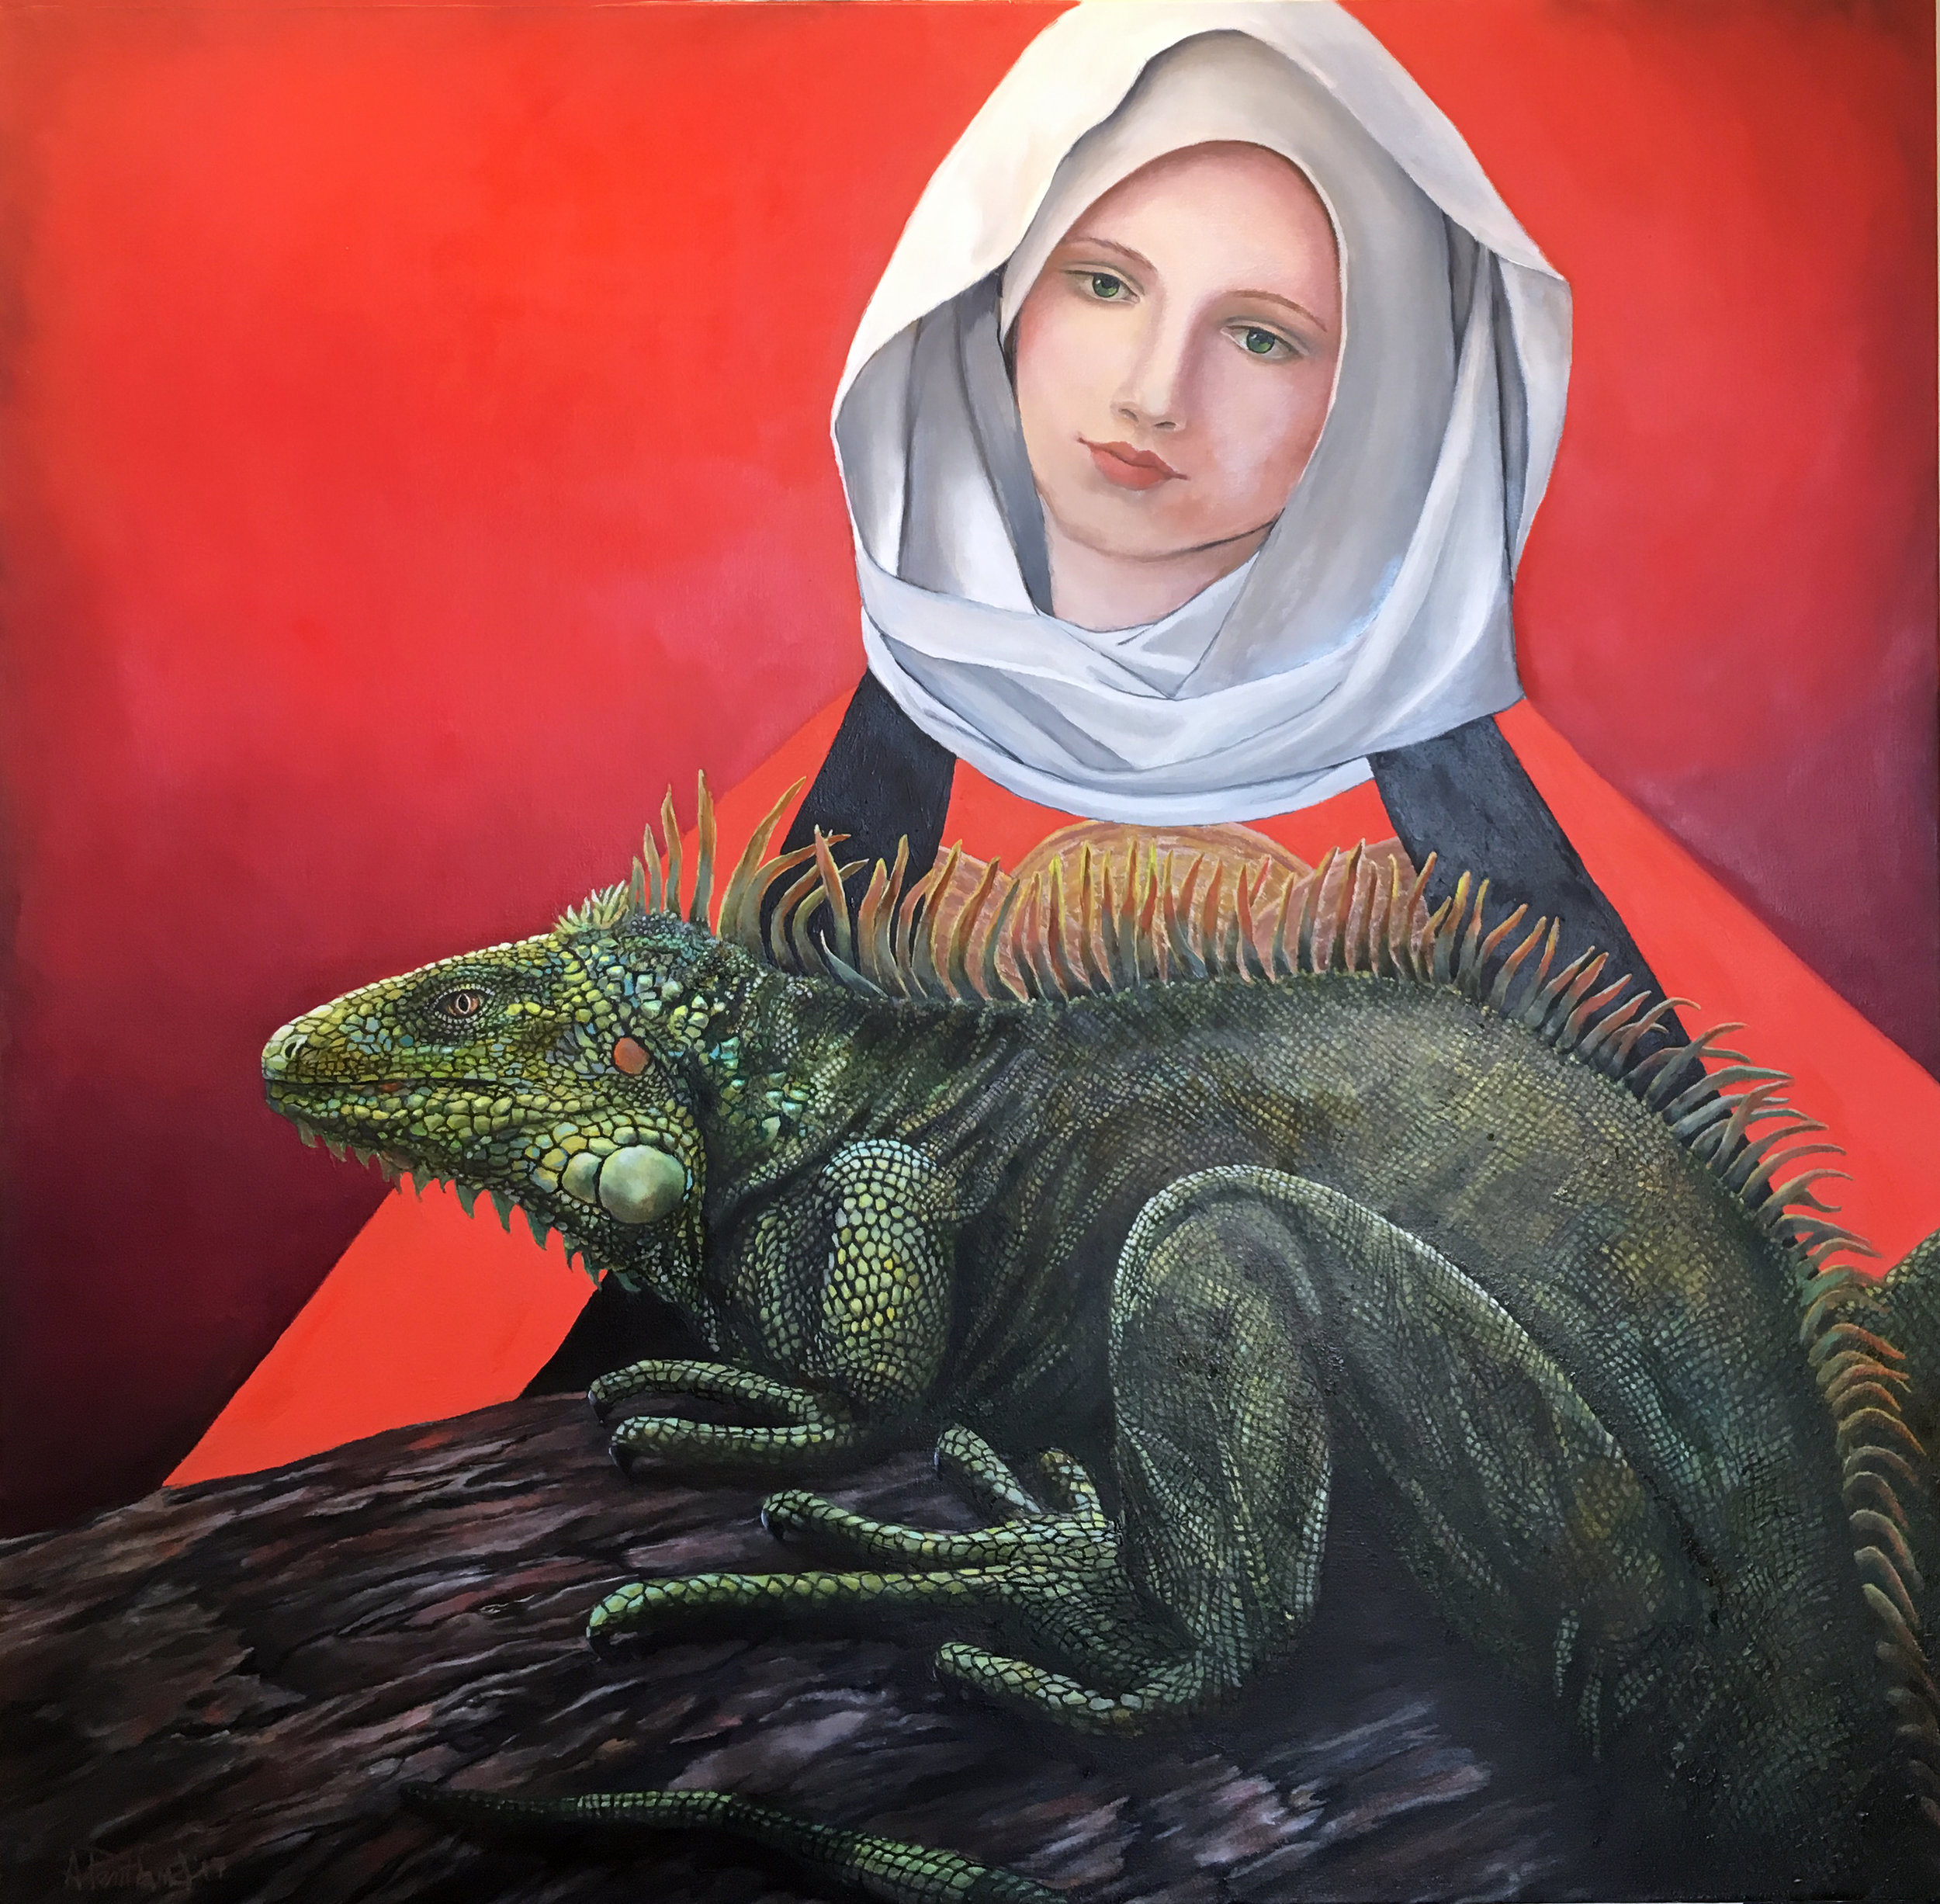 The Iguana Madonna